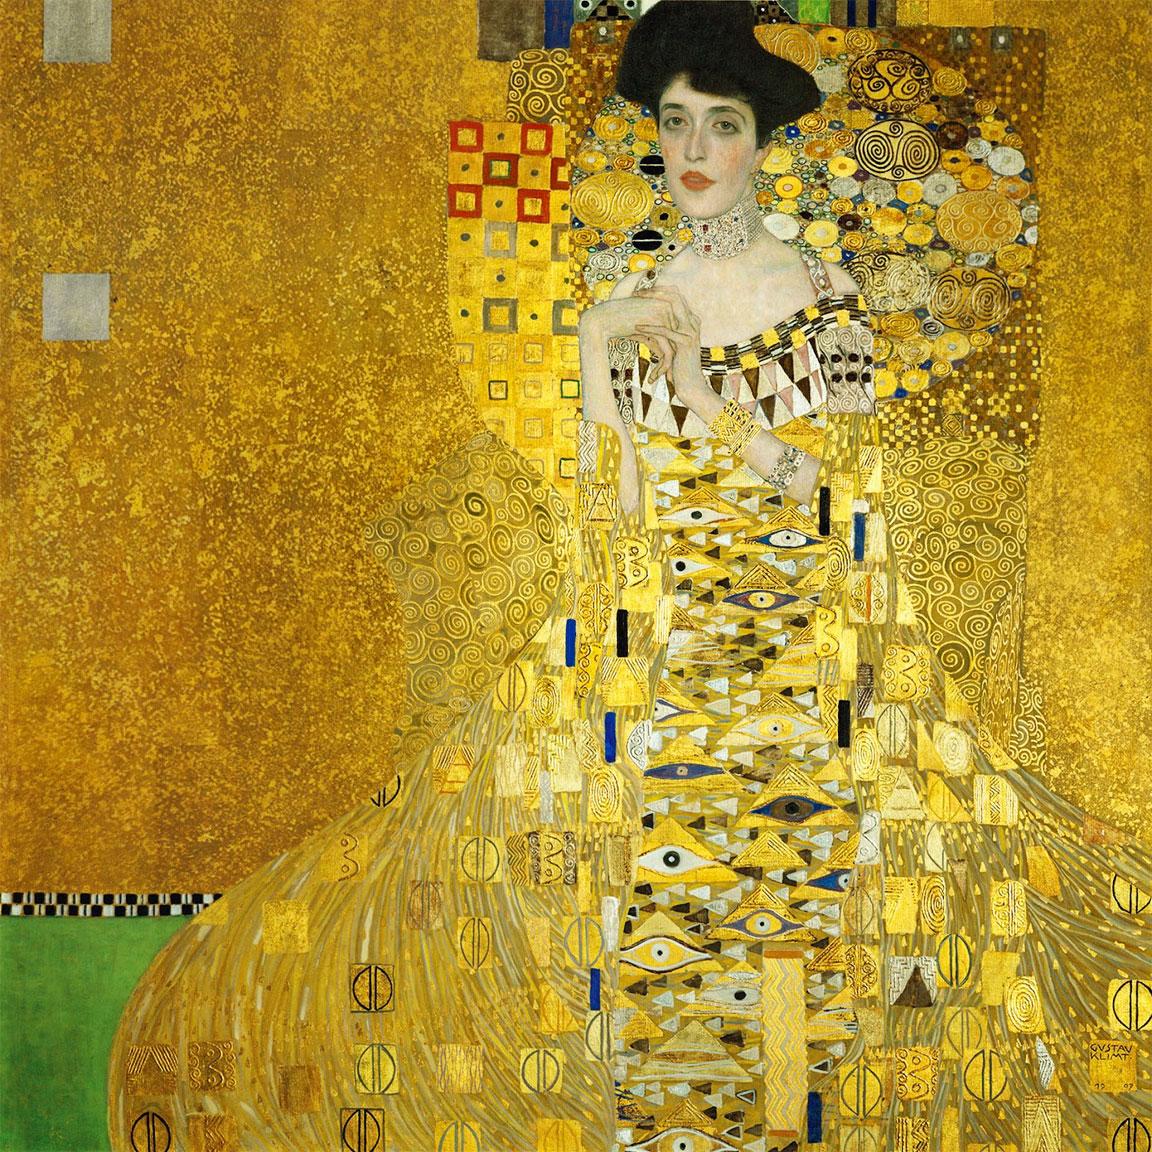 Ritratto di Adele Bloch-Bauer - Gustav Klimt